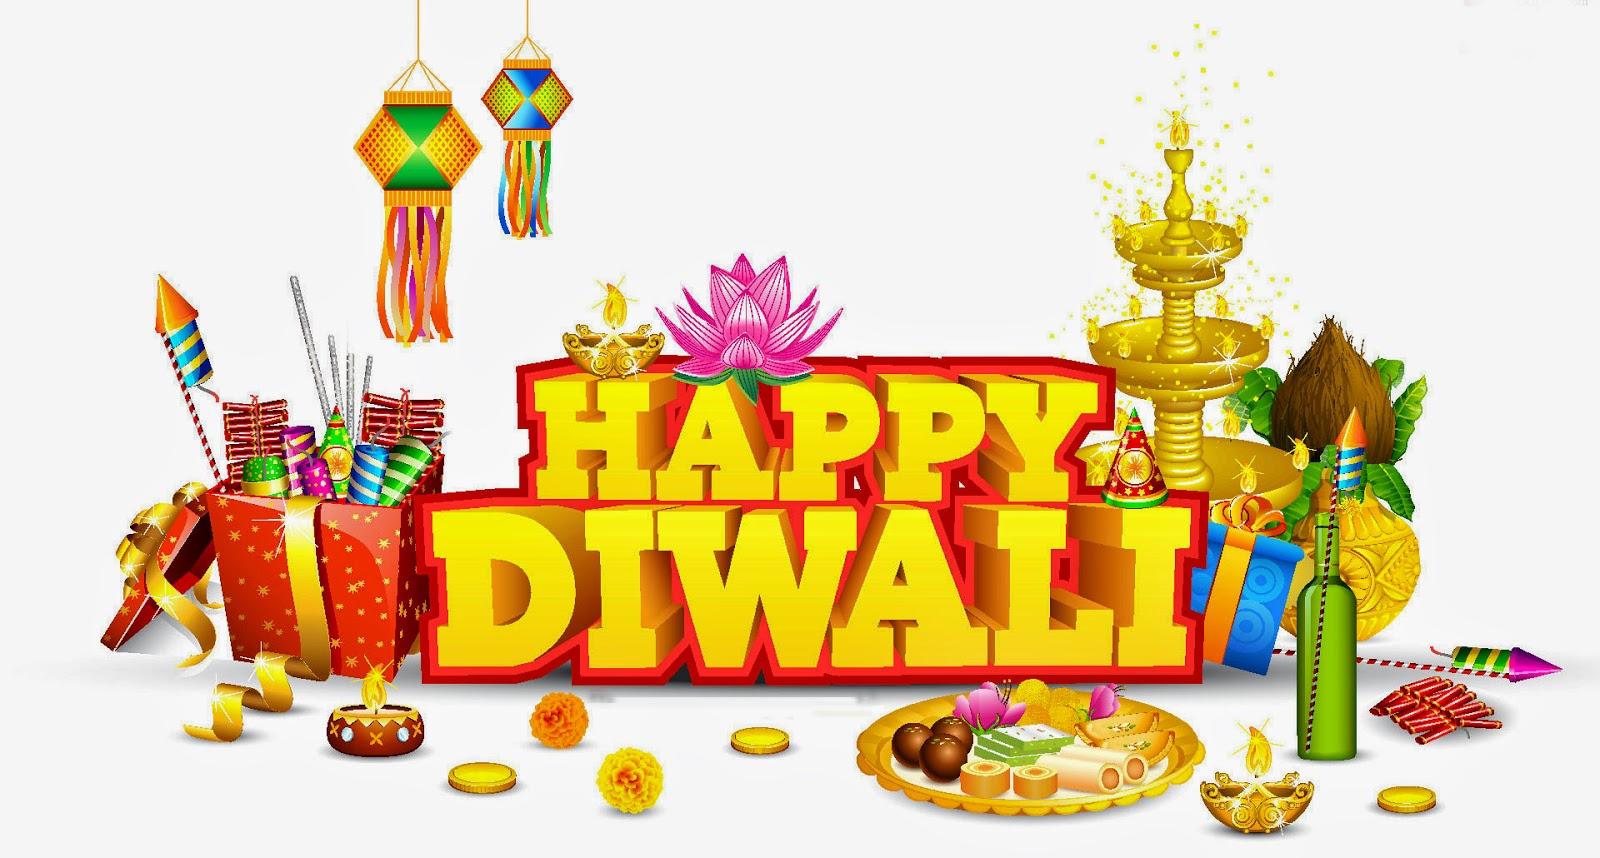 High Quality Diwali Wallpaper: Diwali Wallpapers Free Download